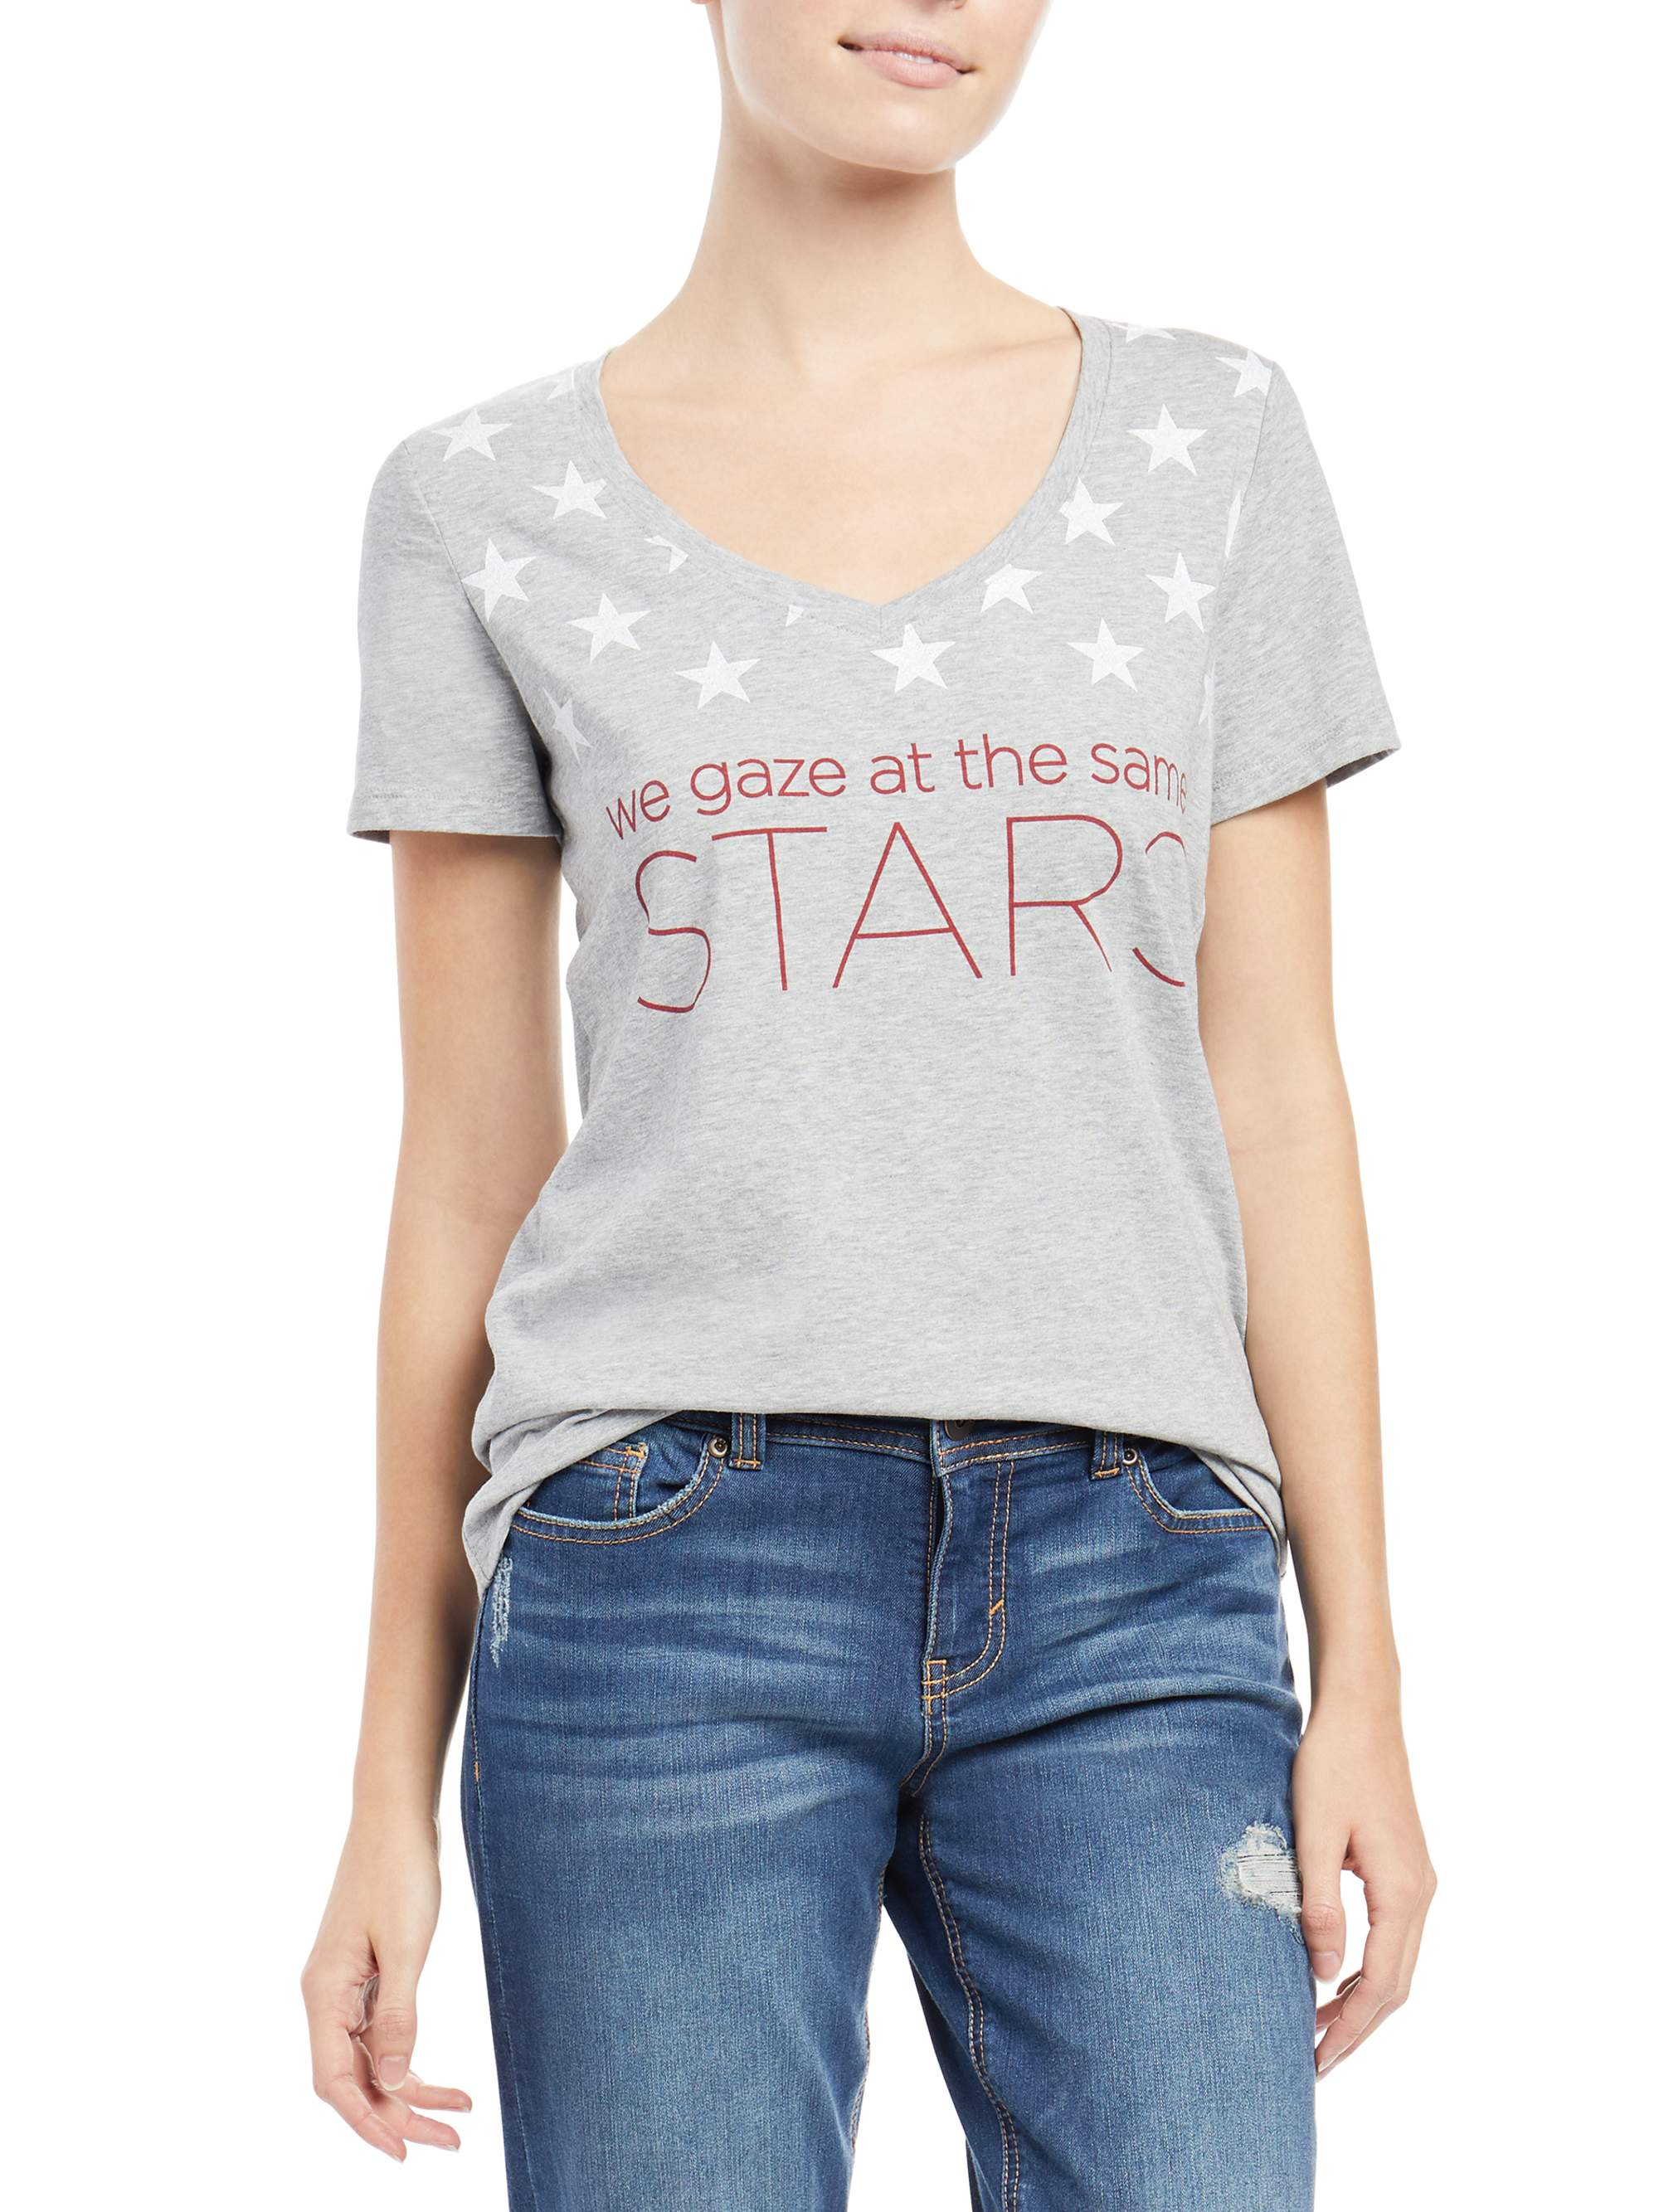 Stars V Neck Graphic Tee Women's